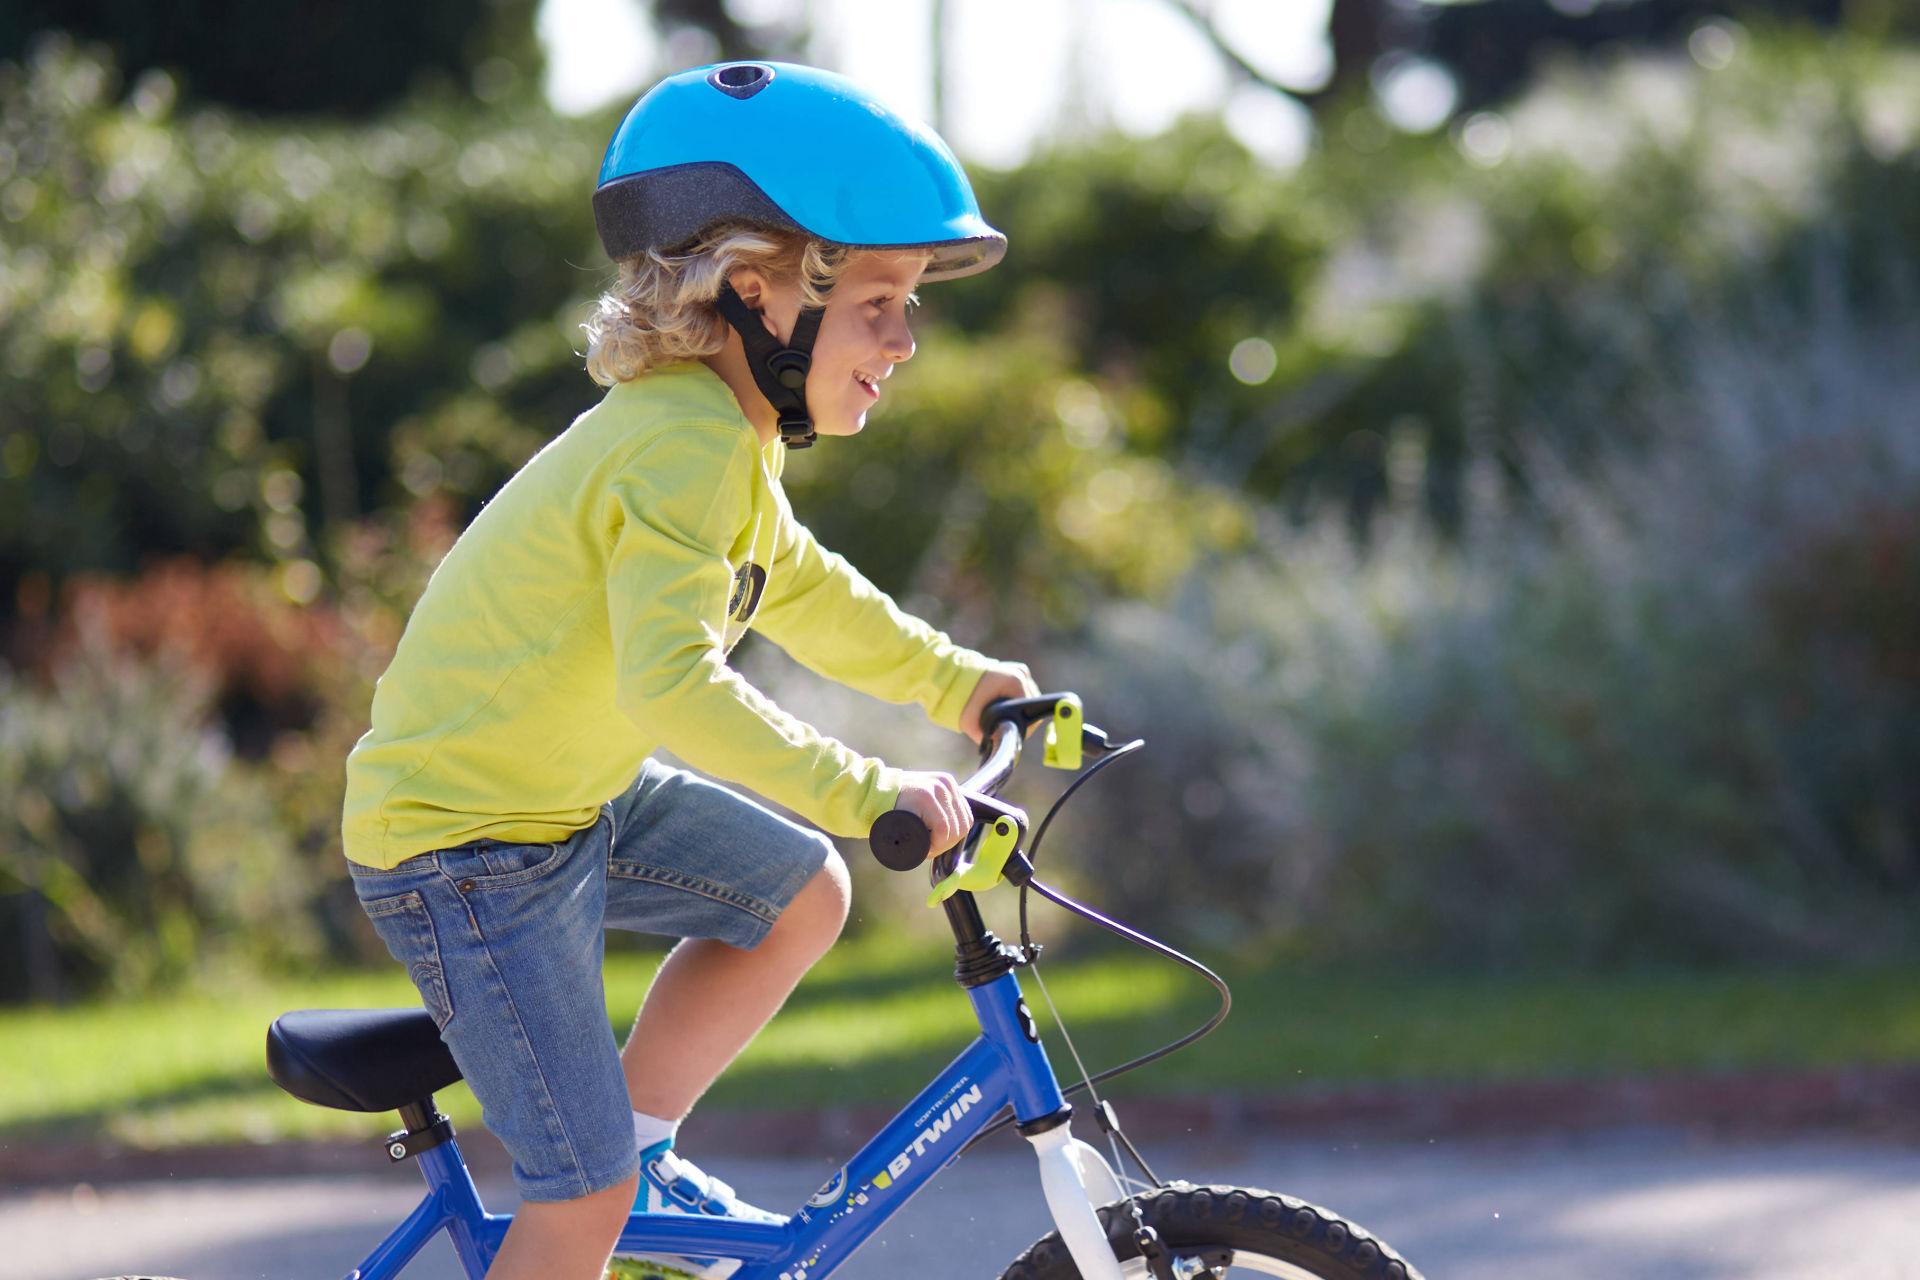 825bd323d77 Btwin Cop Trooper Kids' 16-Inch Bike - Blue 2017 - First Bike bike